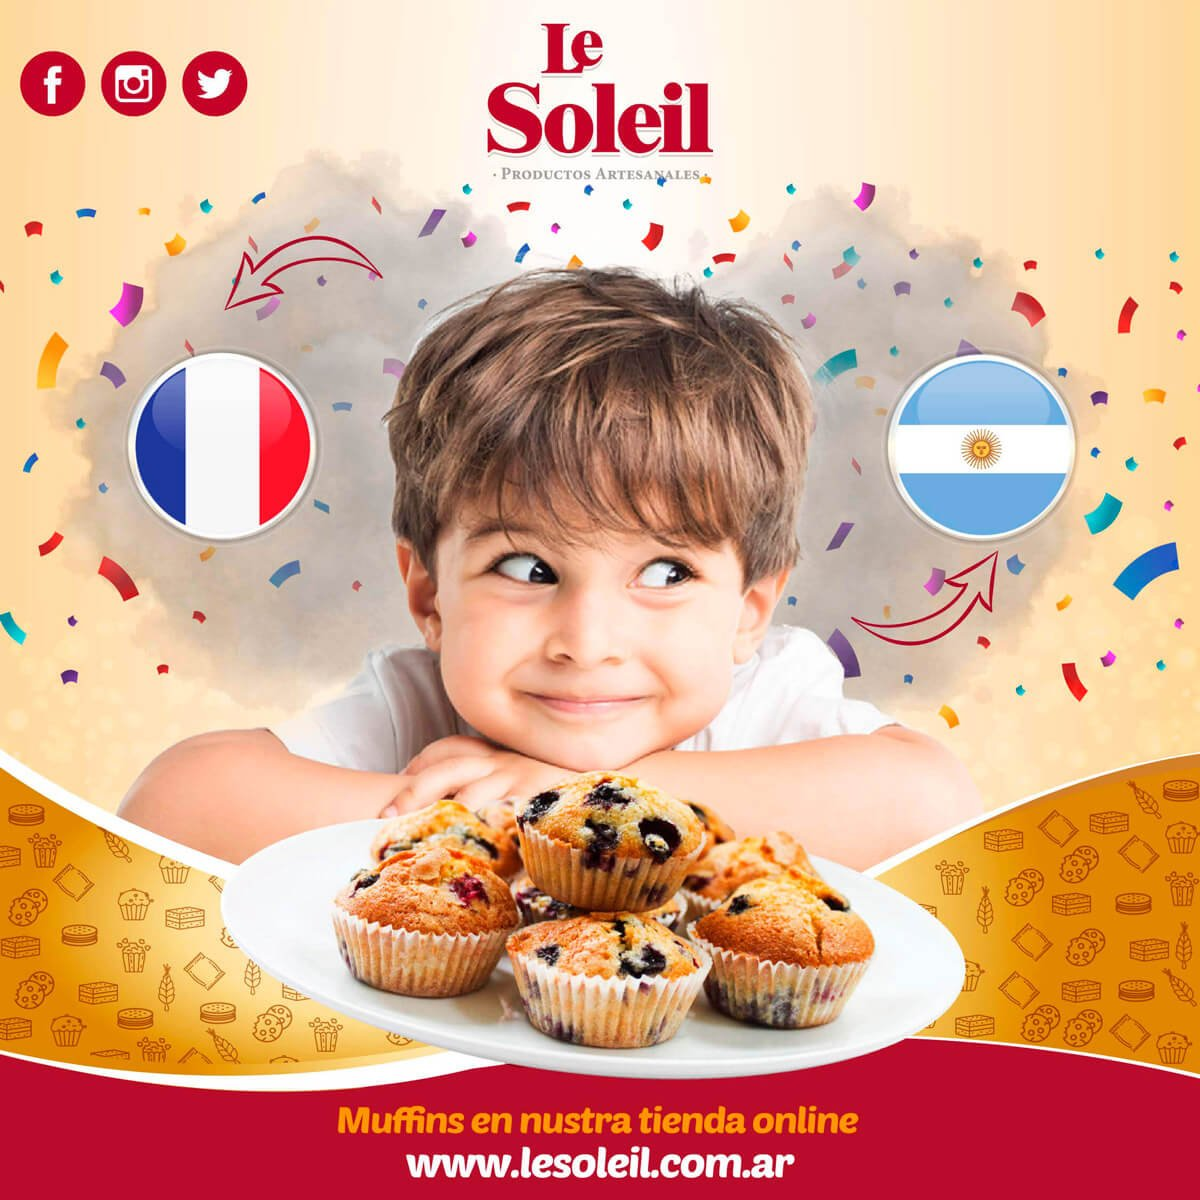 05-Le-Soleid